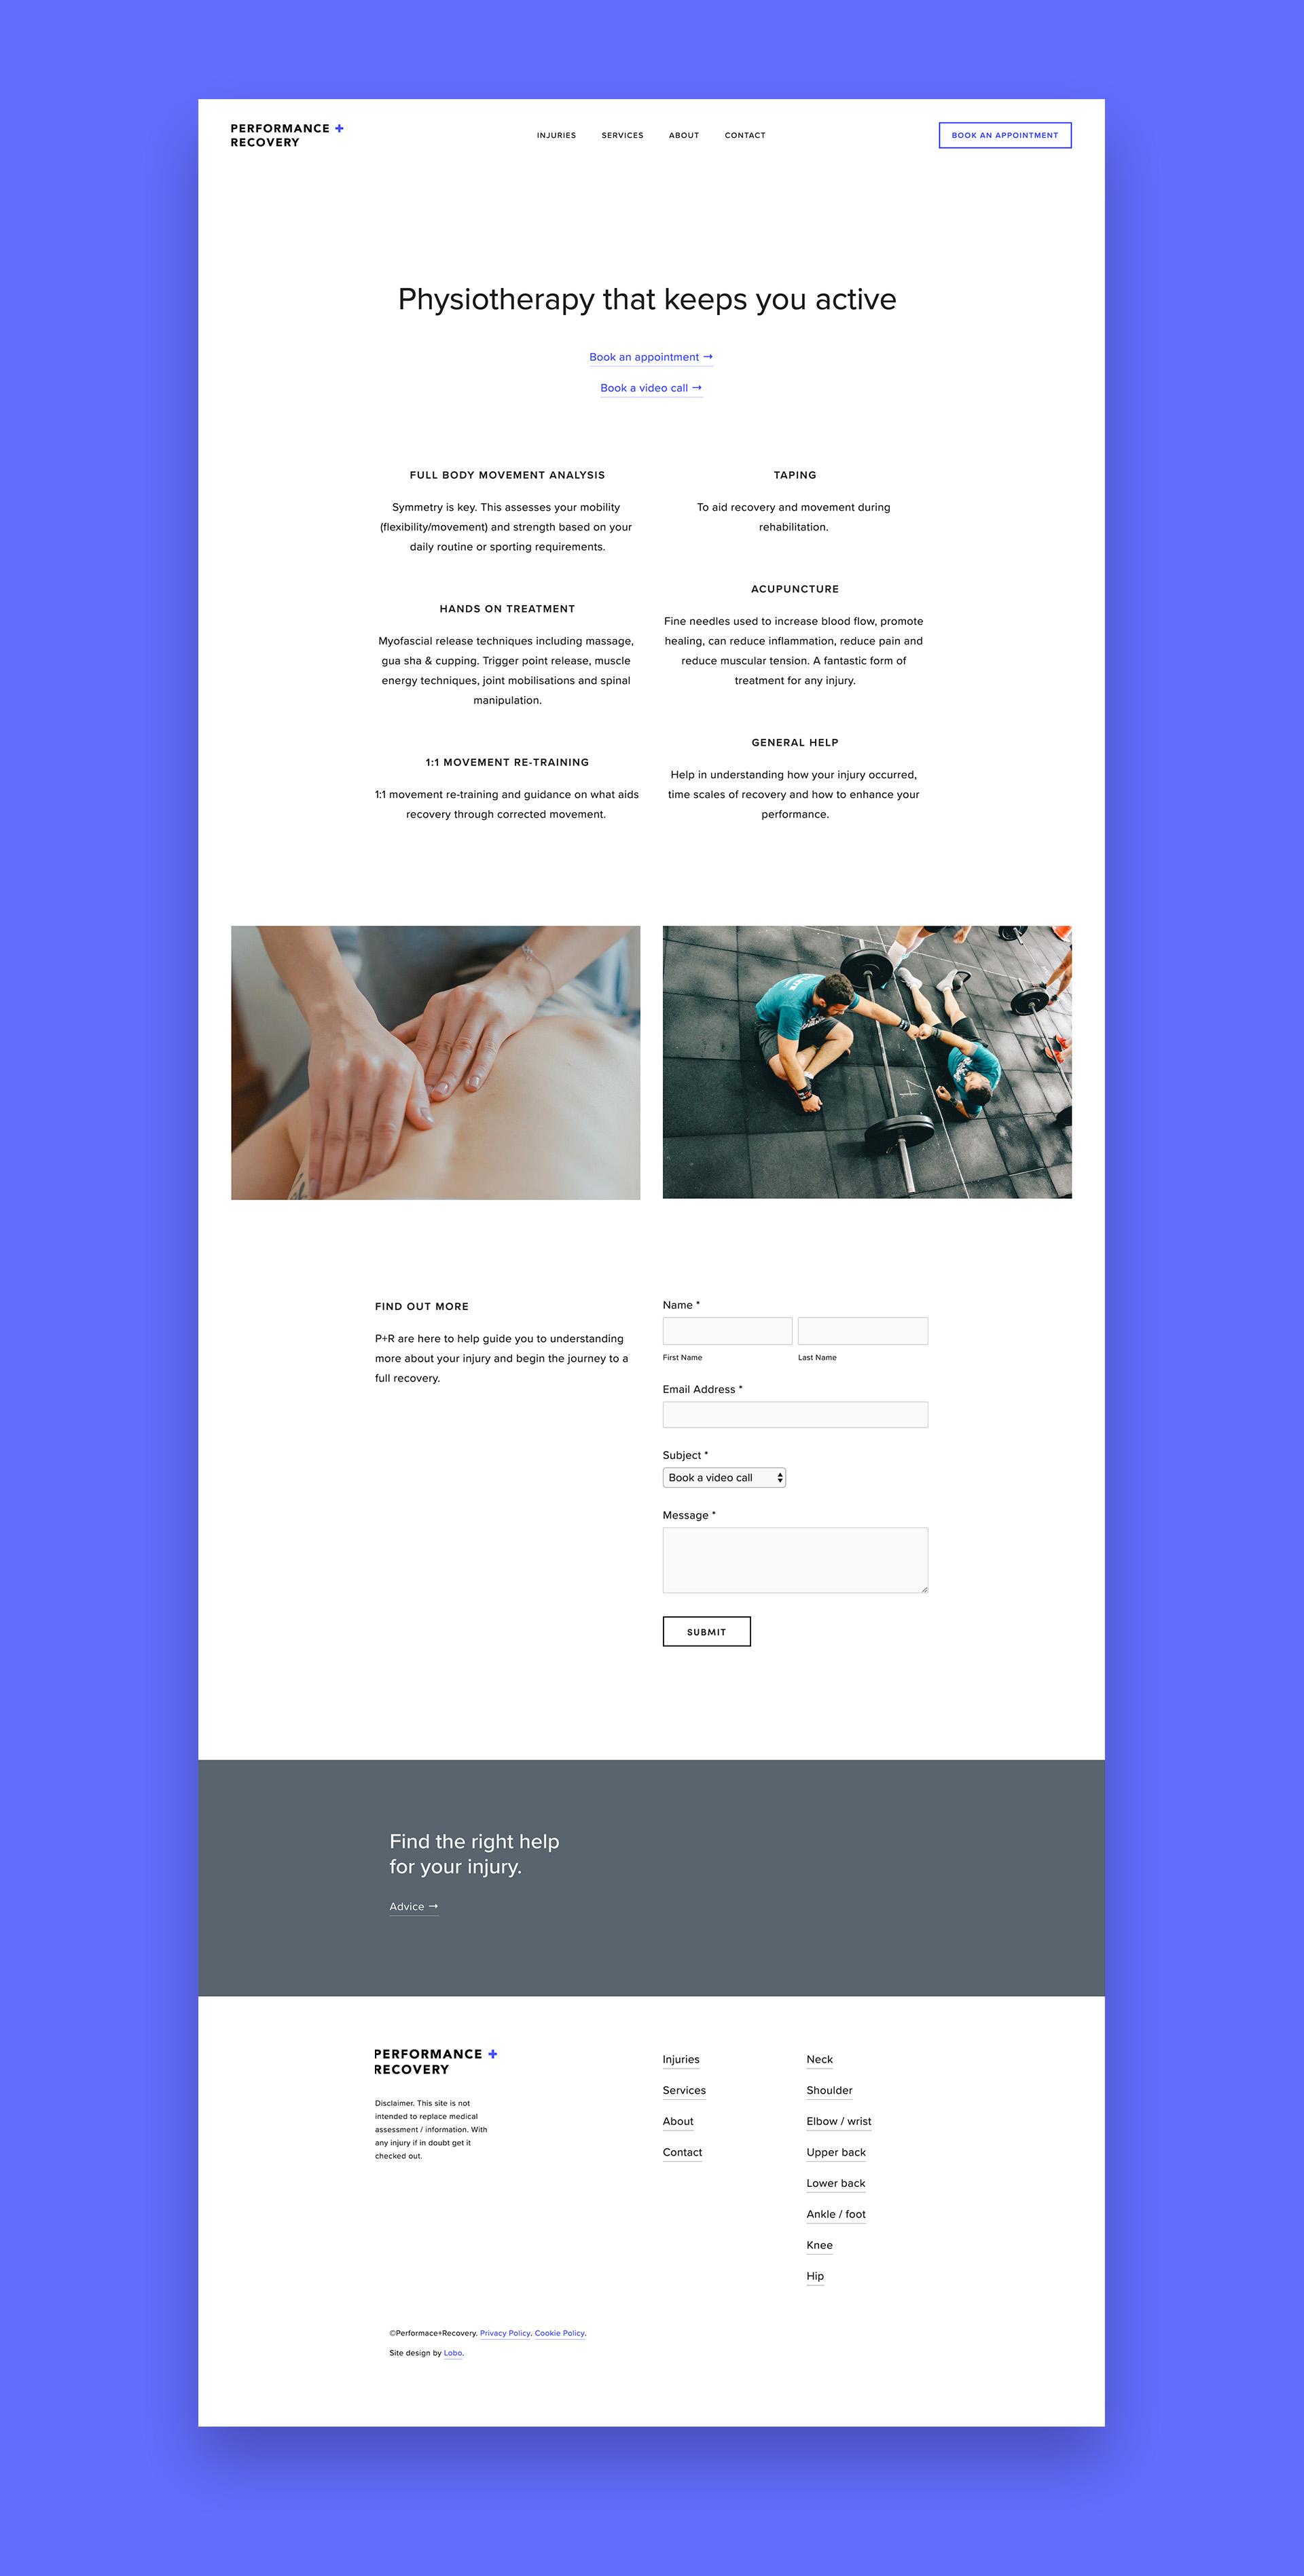 05-Lobo-Creative Performance+Recovery Bournemouth-brand-design-website-design-case-study.jpg